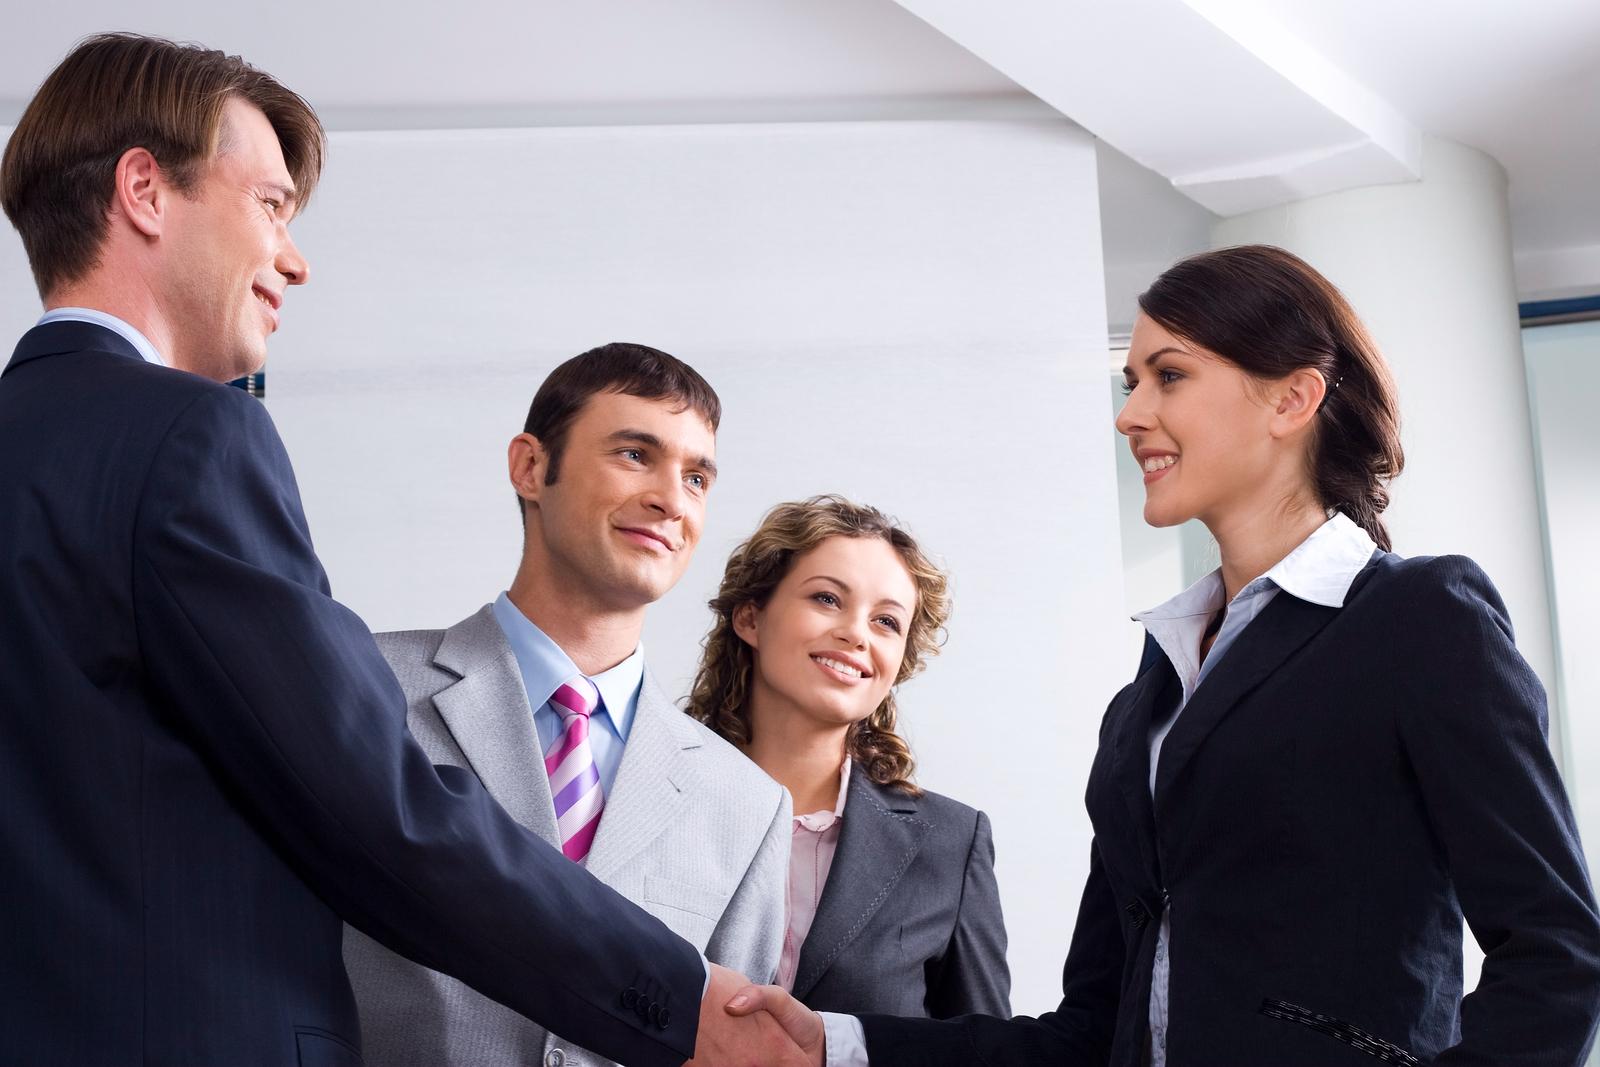 bigstock-Business-Meeting-2426635.jpg